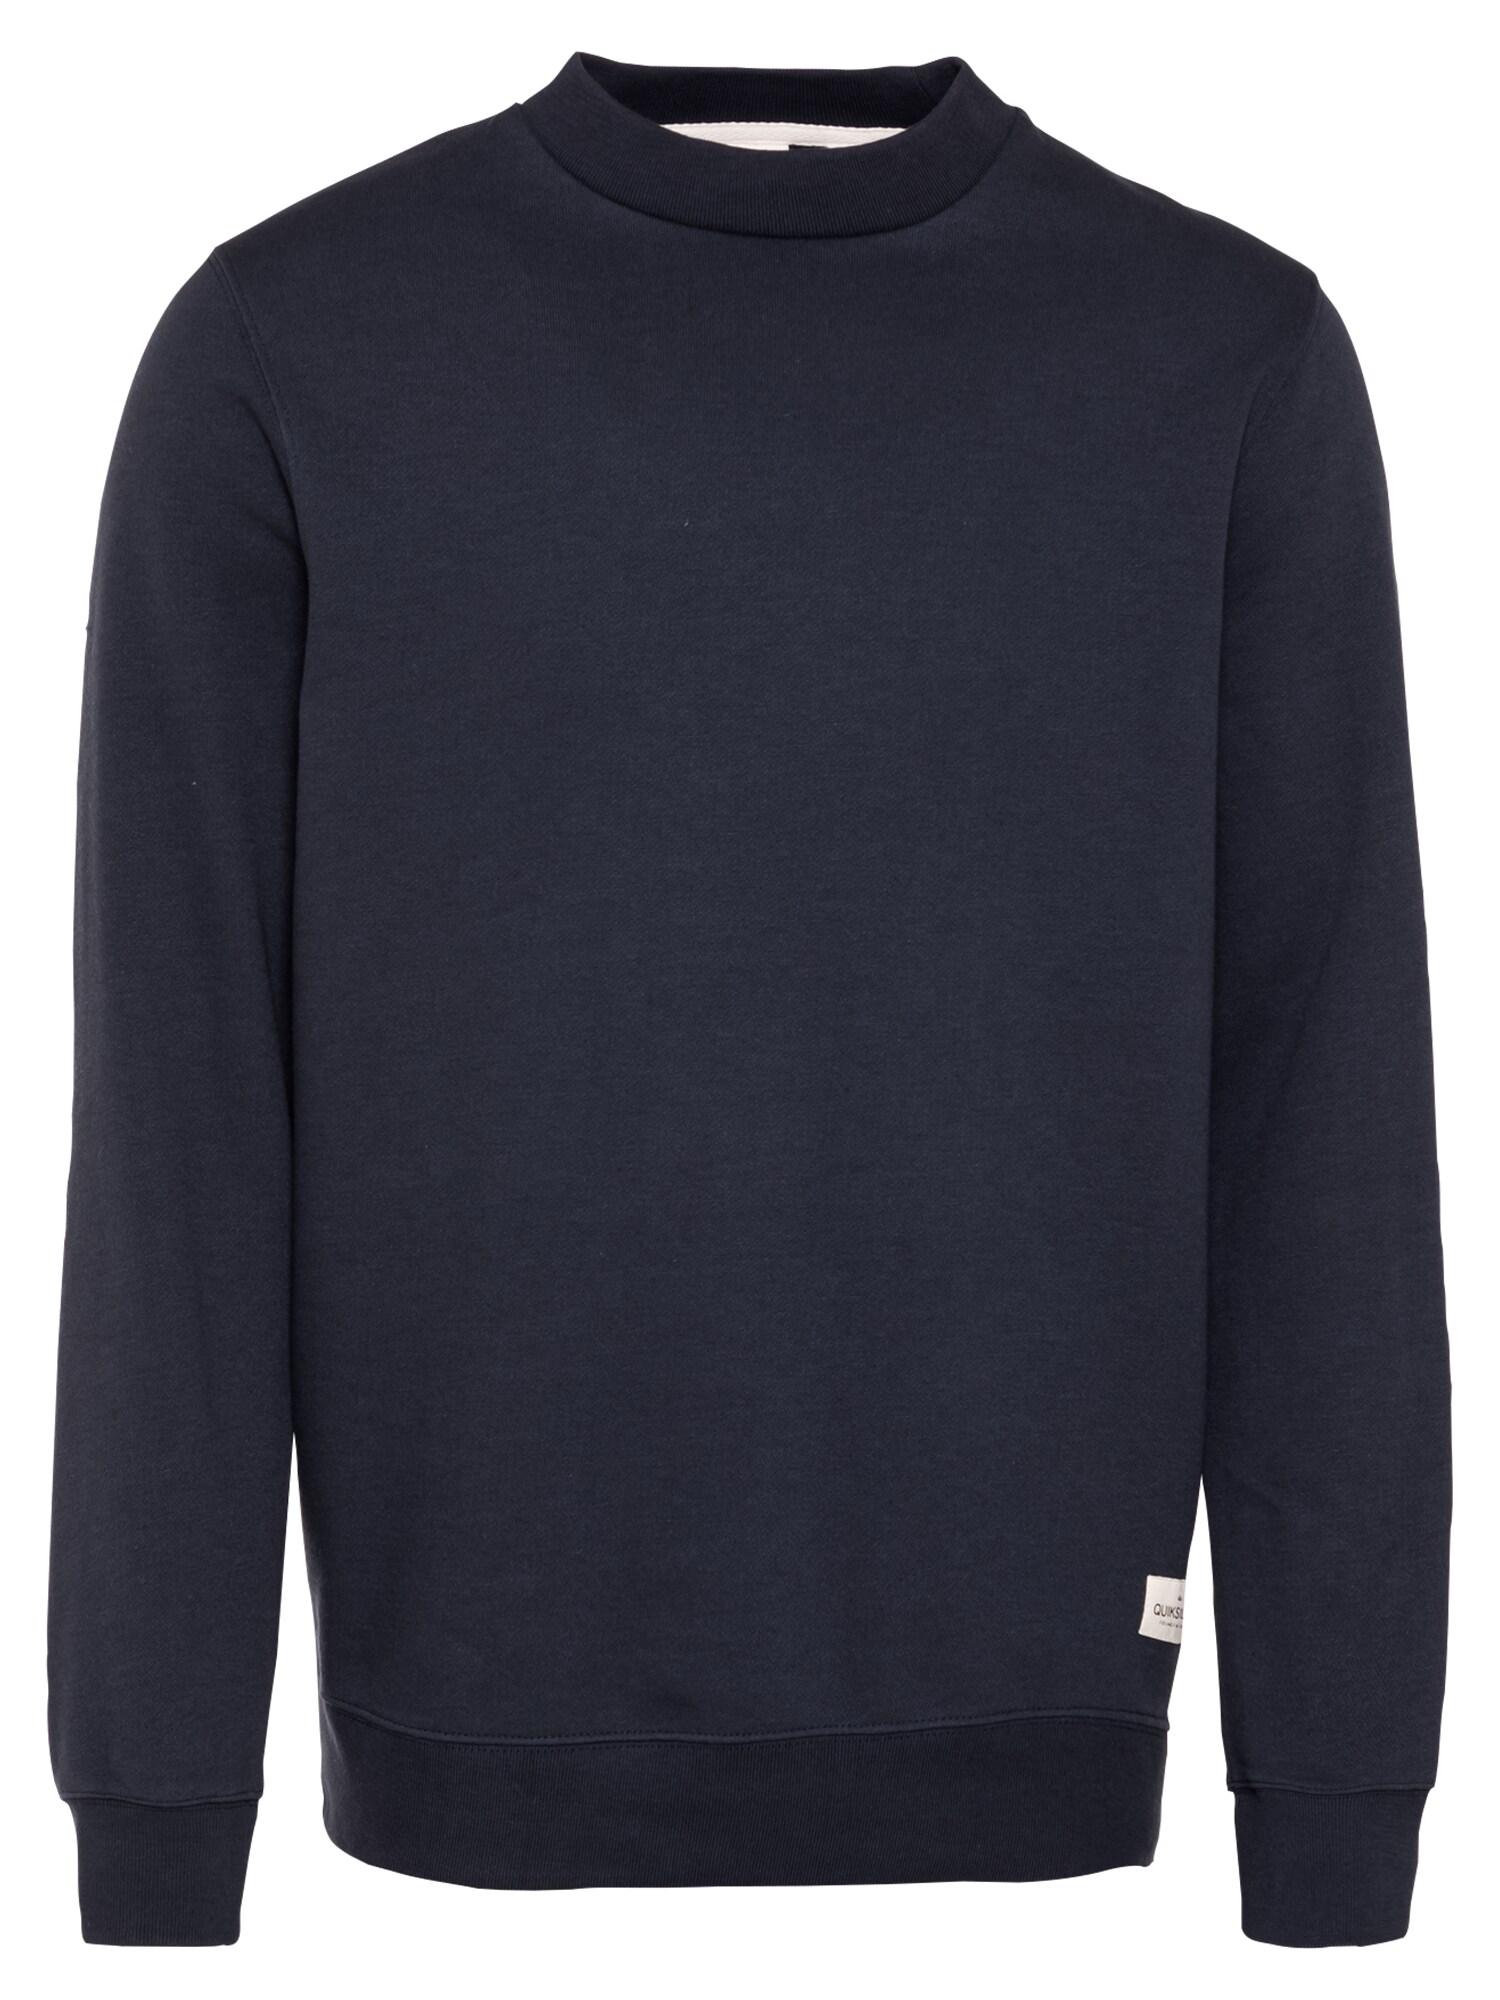 QUIKSILVER Sportinio tipo megztinis tamsiai mėlyna